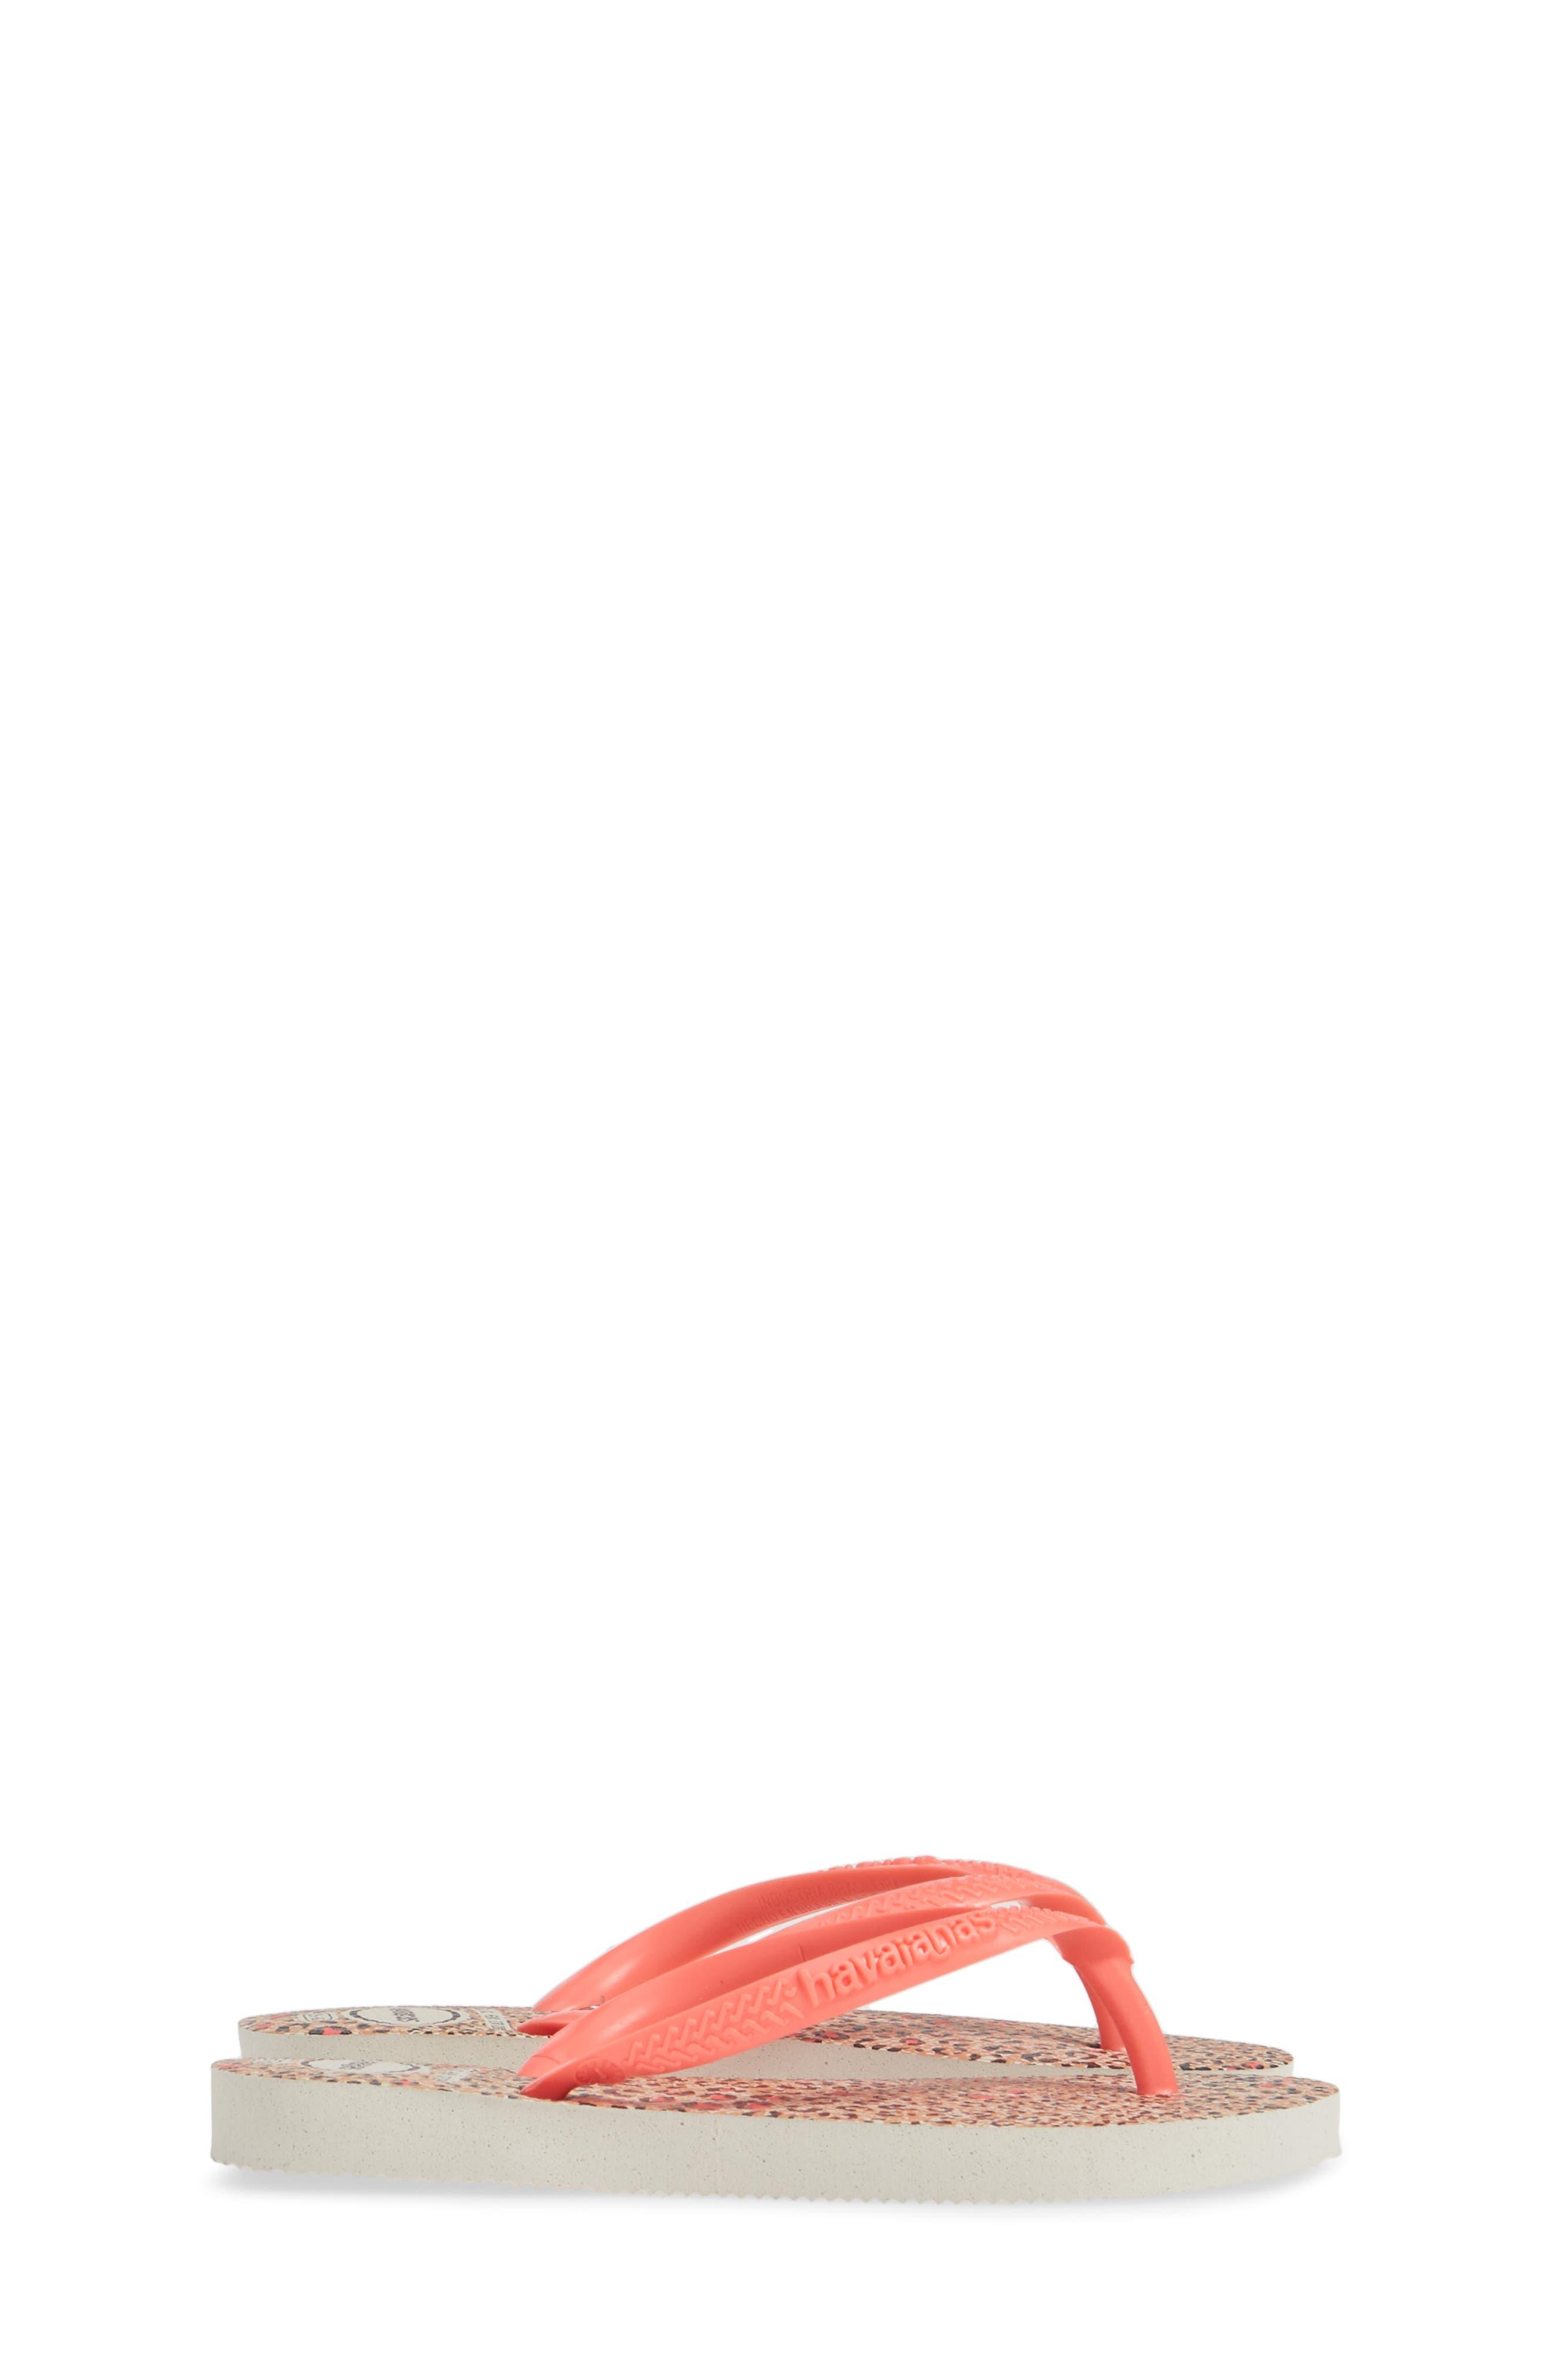 HAVAIANAS,                             'Slim' Animal Print Flip Flop,                             Alternate thumbnail 4, color,                             WHITE/ CORAL